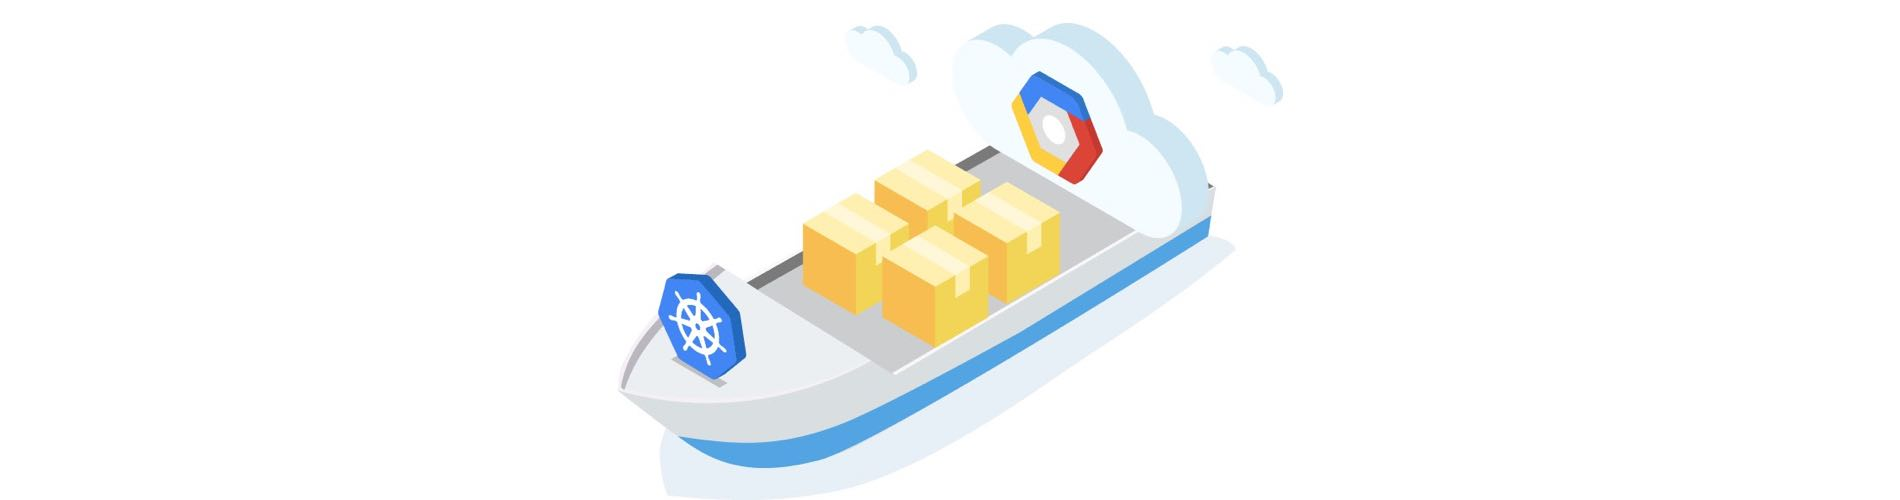 Google Cloud Build feature image